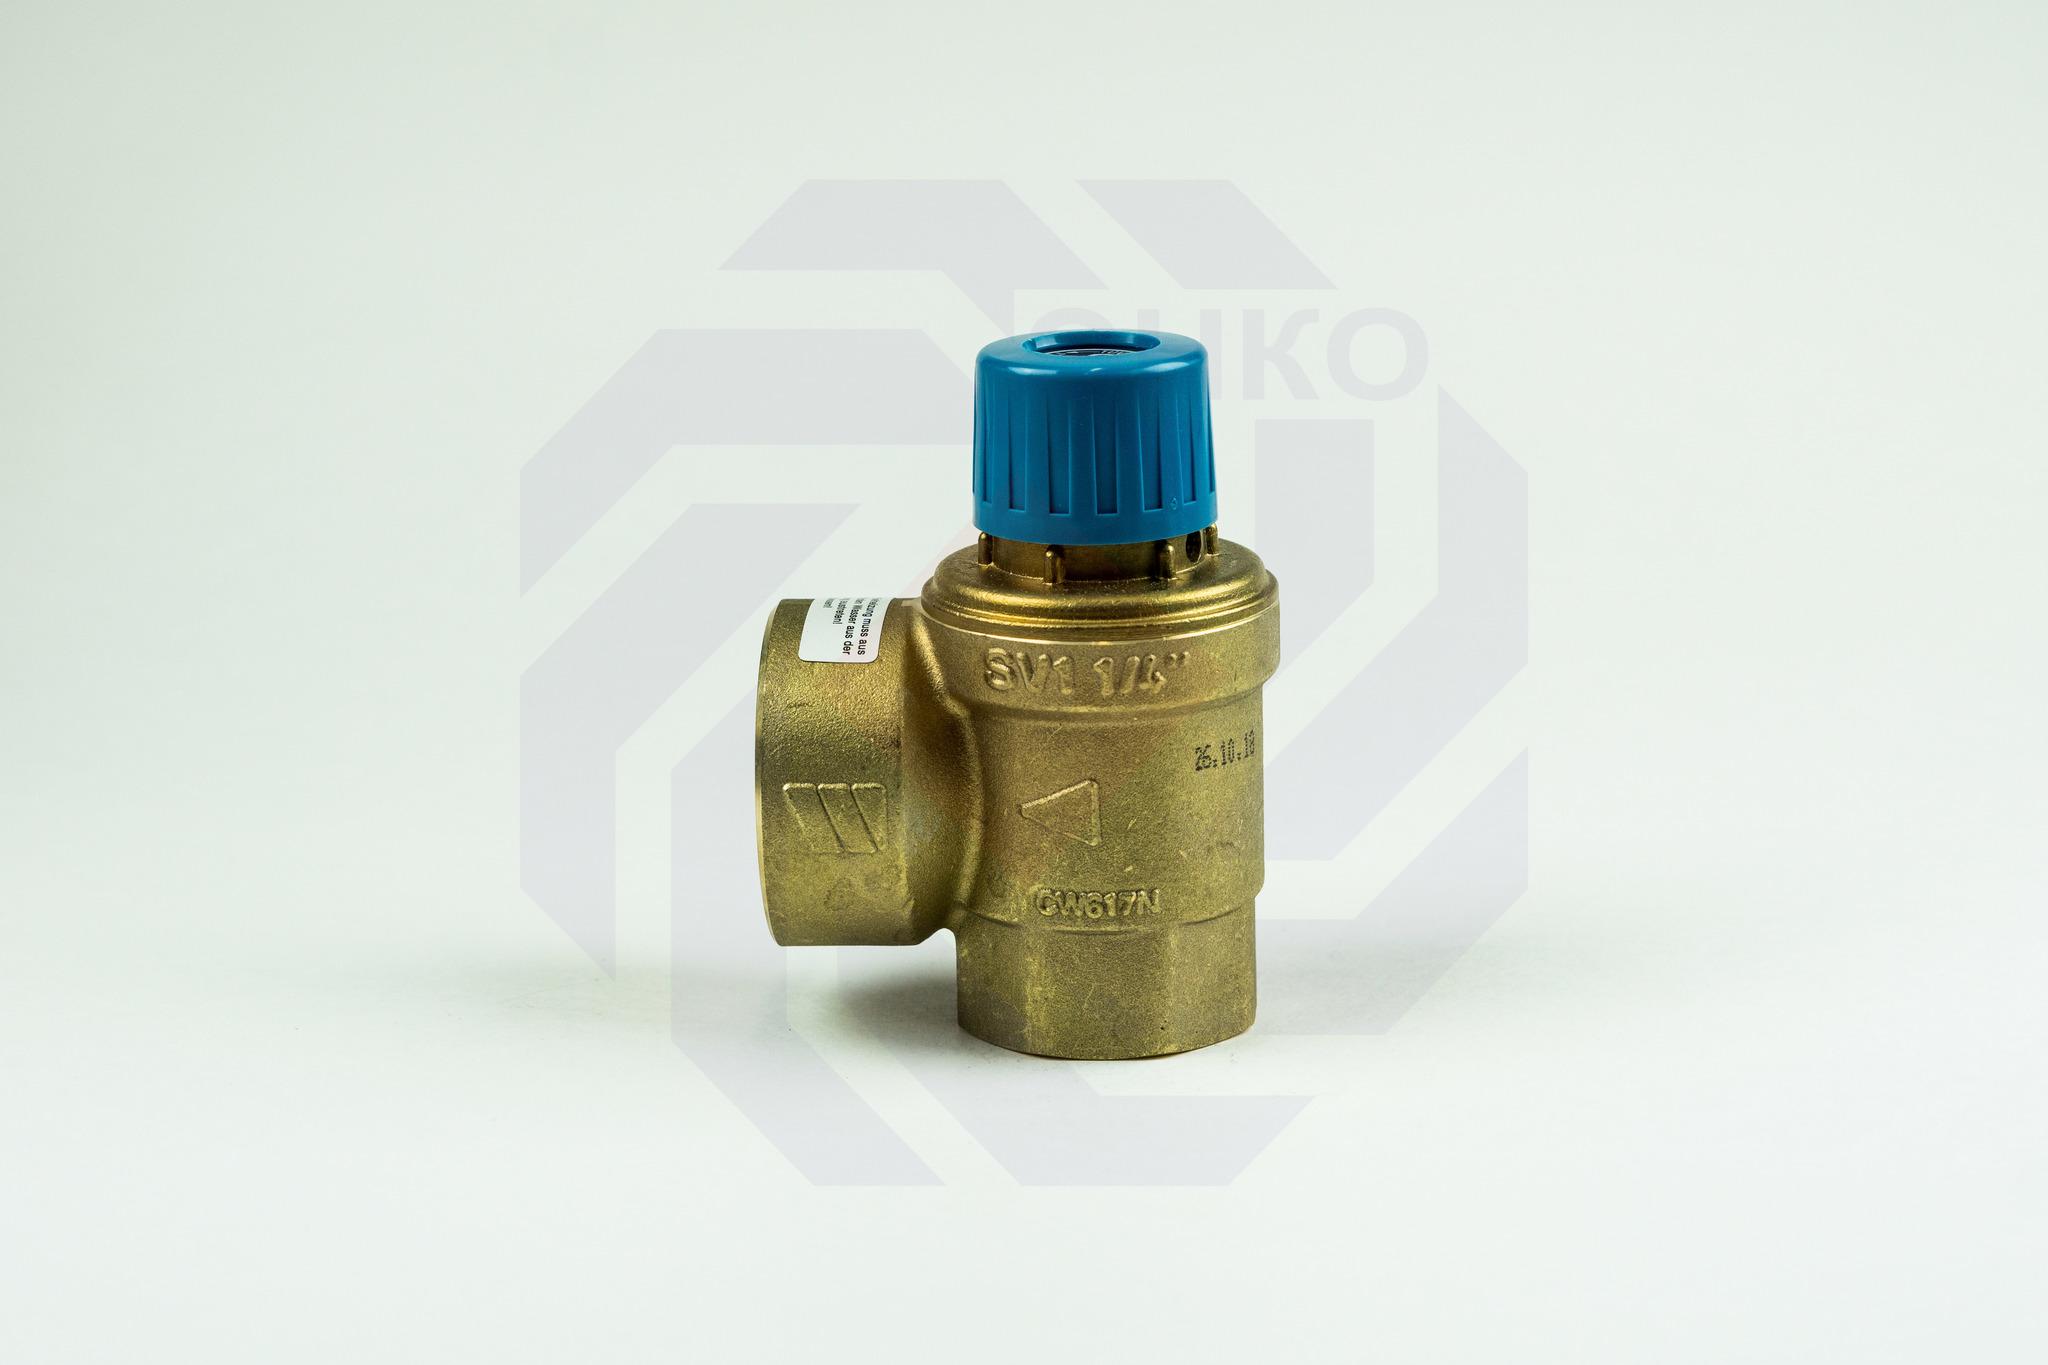 Клапан предохранительный WATTS SVW 8 бар 1¼